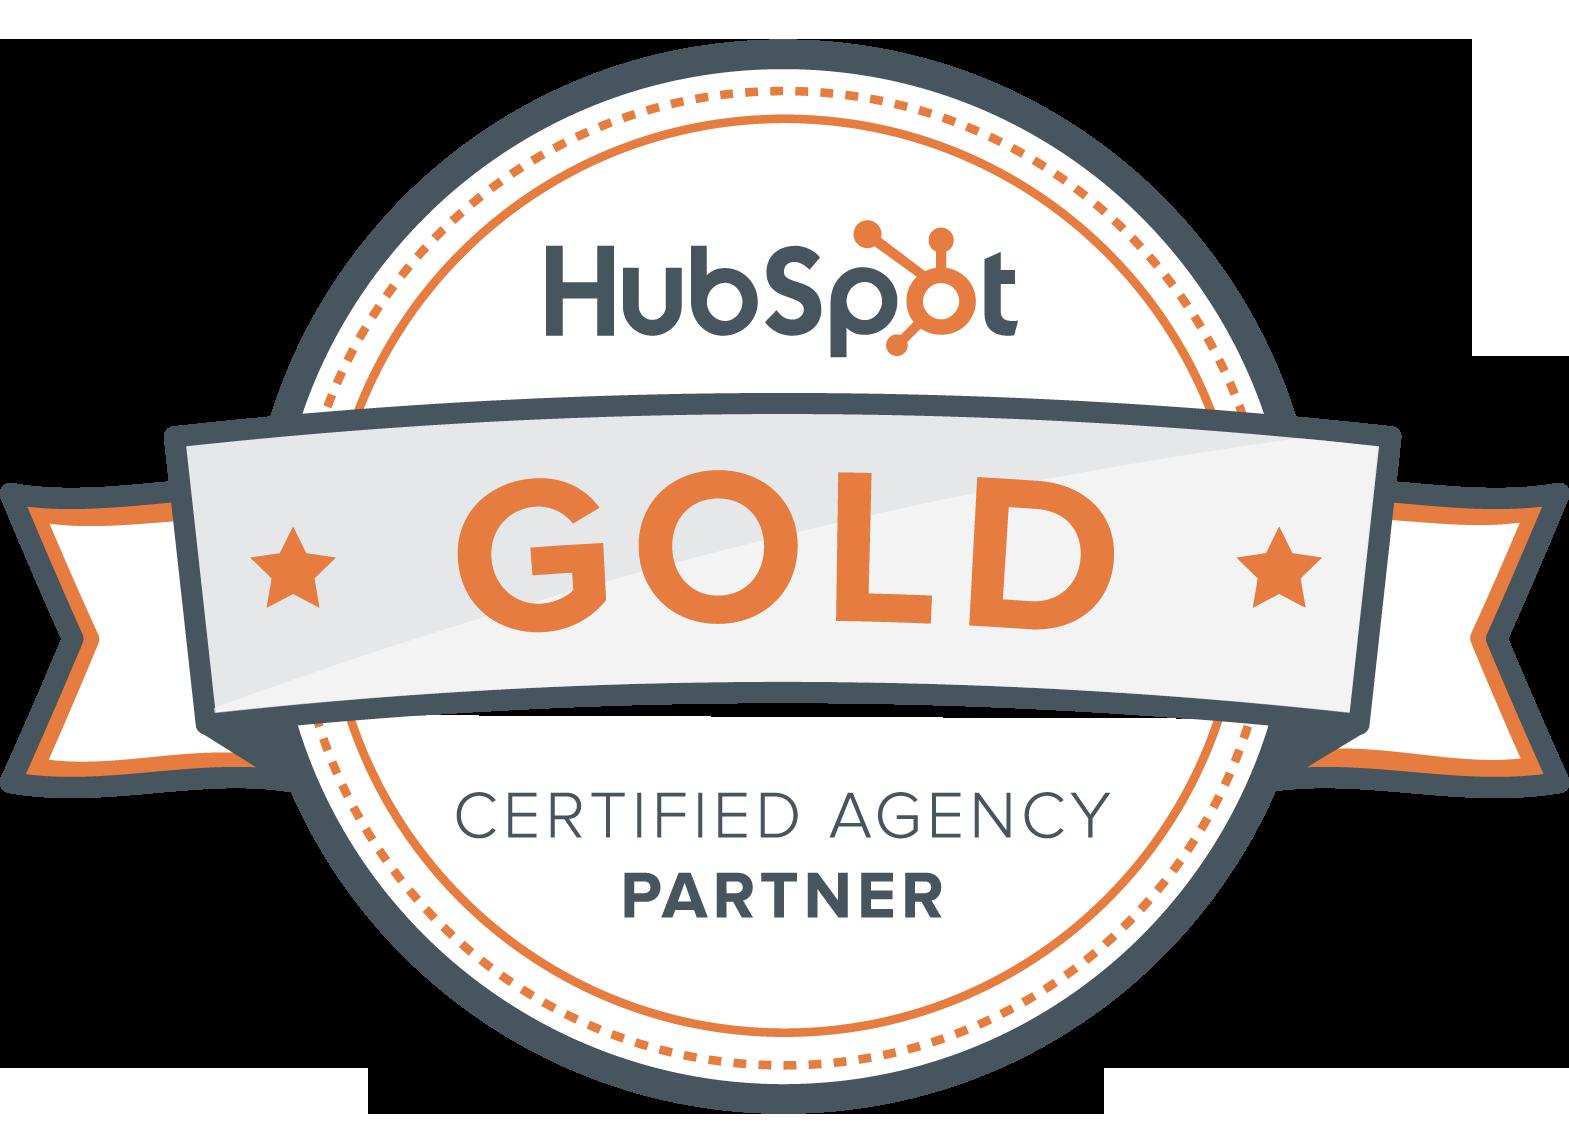 Hubspot-Gold-partner-guarana